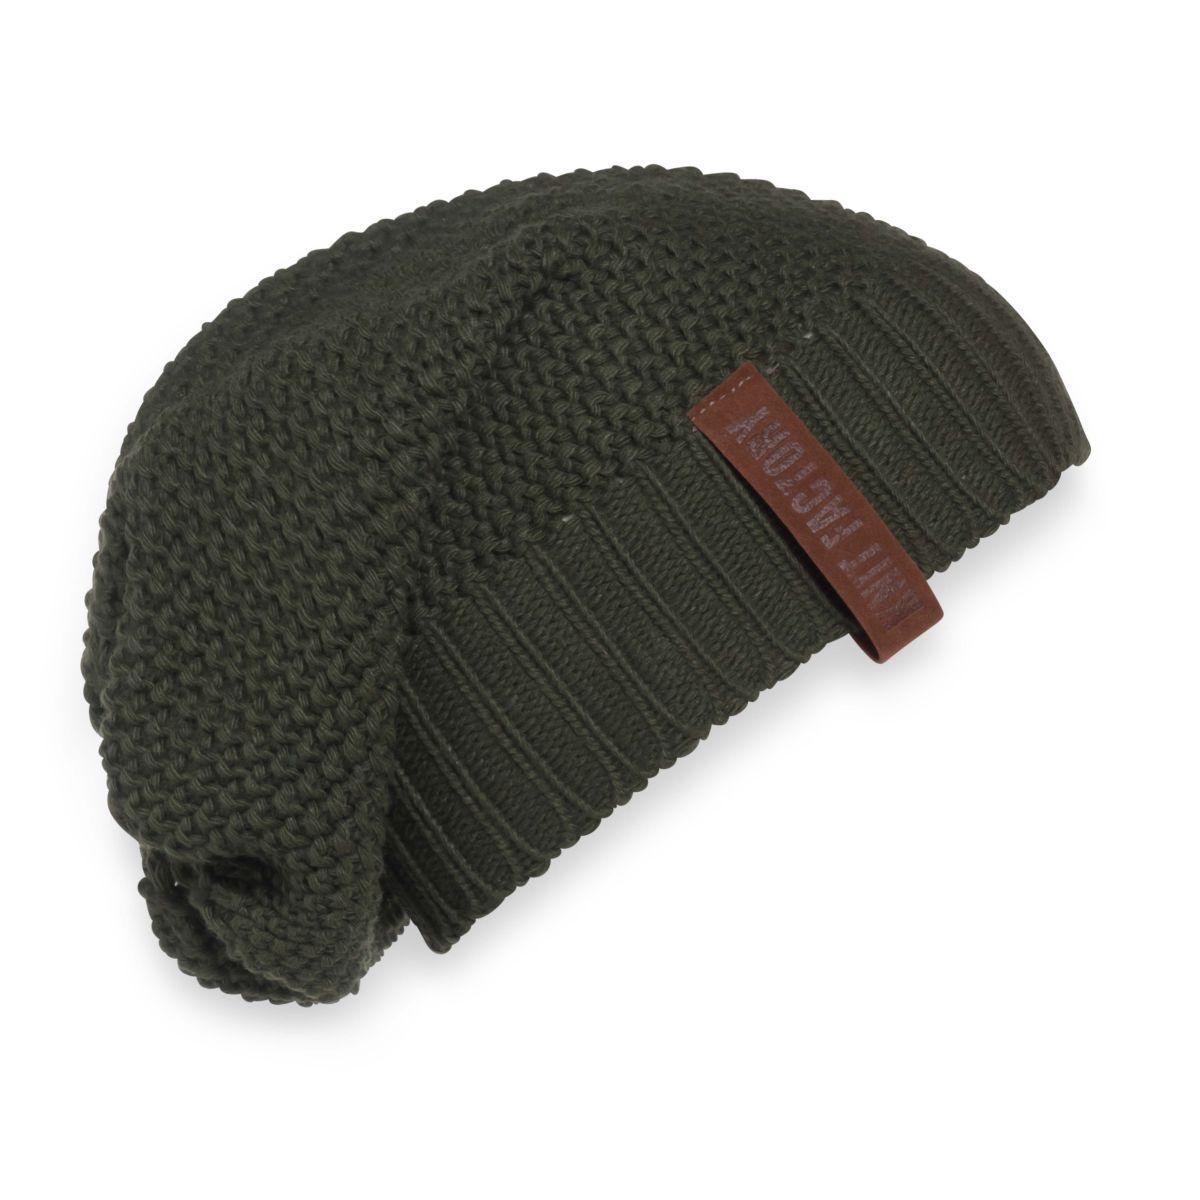 knit factory 1207025 coco beanie khaki 1